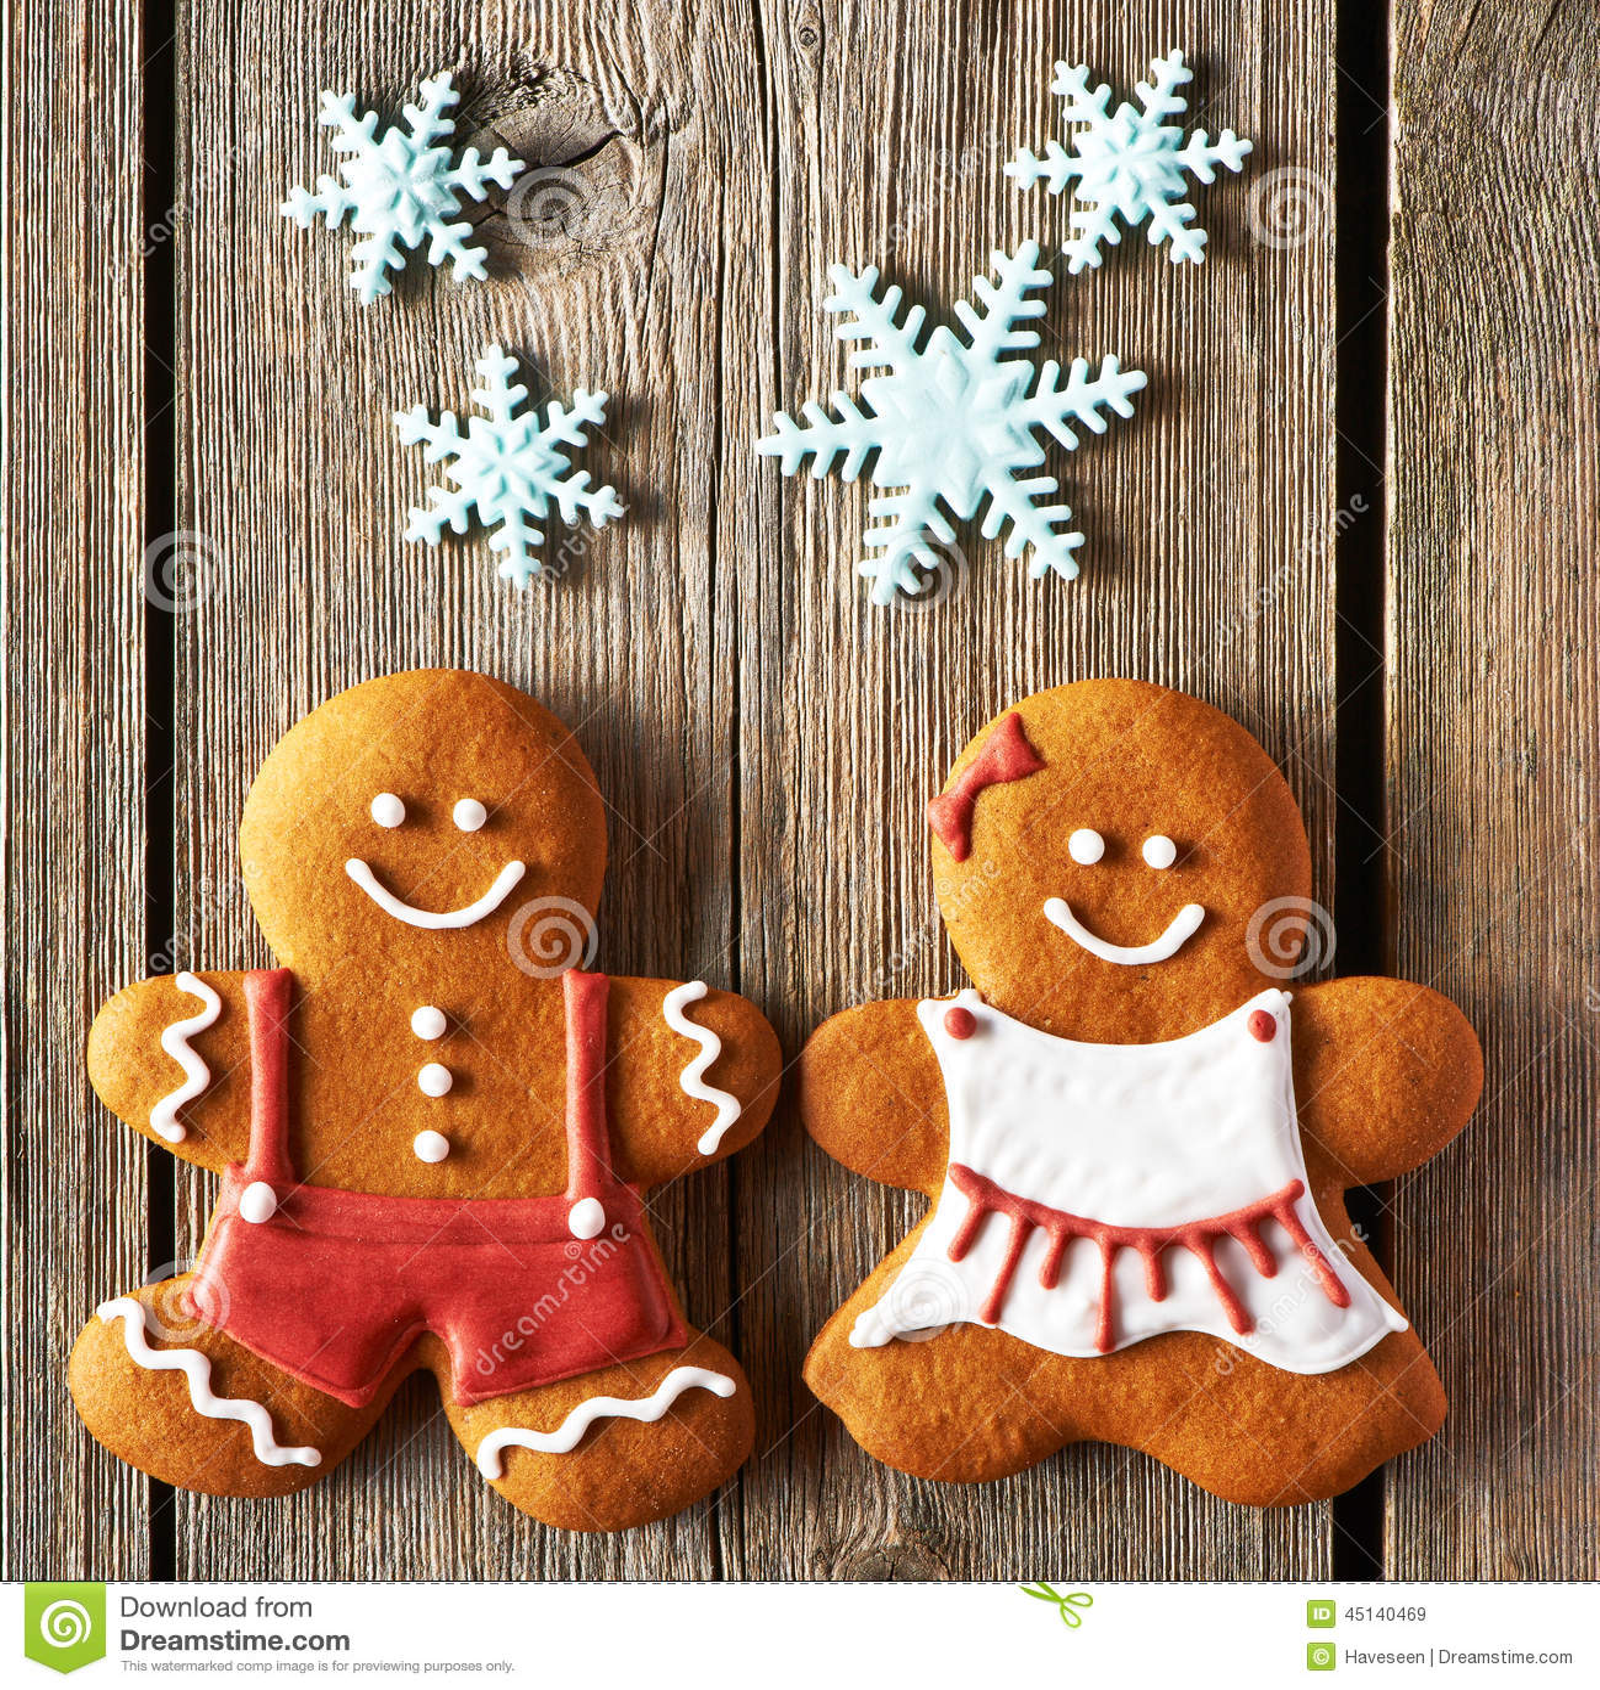 ... Couple Christmas homemade gingerbread couple cookies stock photo